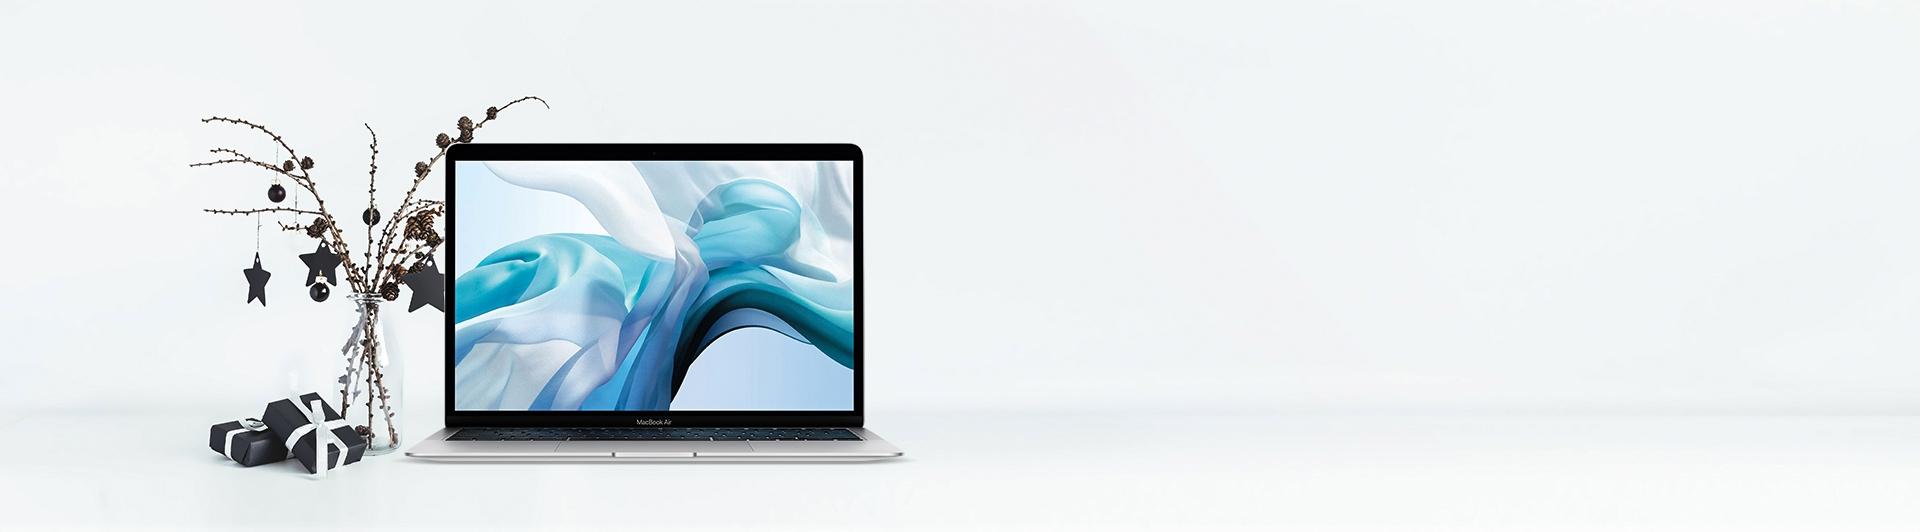 Apple Macbook Air i3 13.3 inch MWTK2SA/A 2020